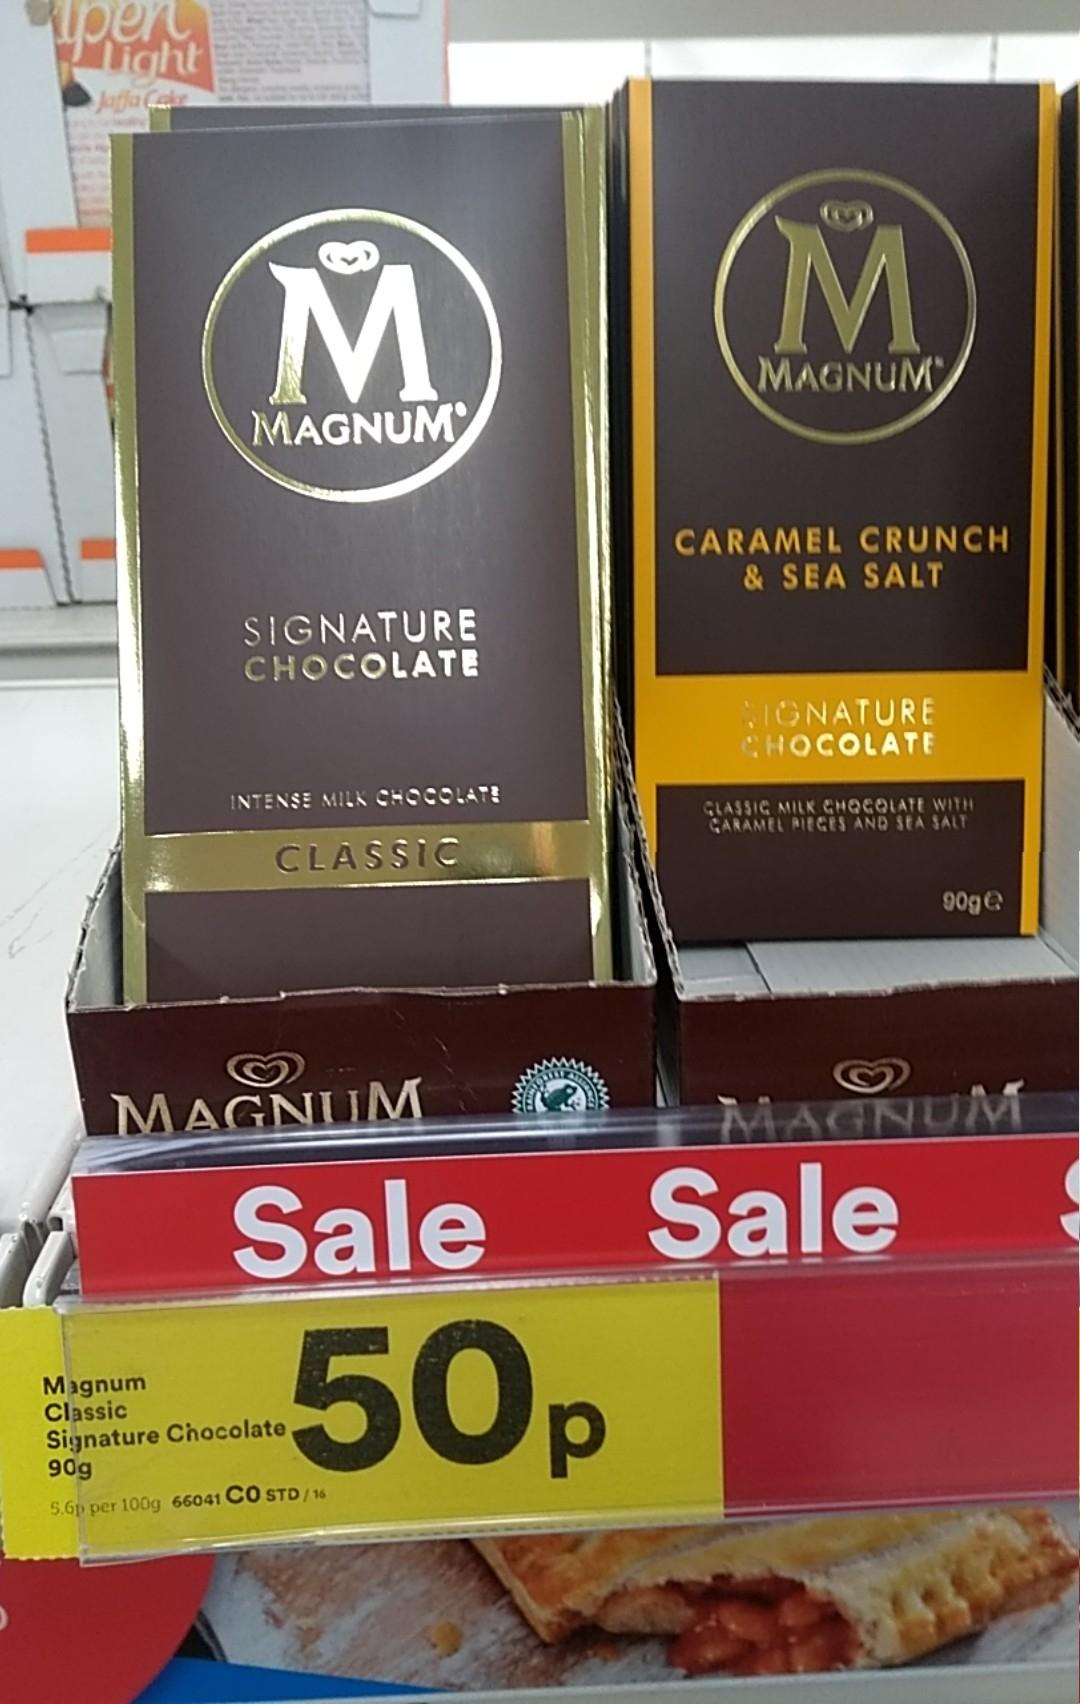 Few Deals @ Iceland: Magnum 90g Classic / Caramel Bars 50p / Guinness Steak Sauce 75p / Tabasco Pepper Sauce 57Ml 75p / Gino D'Acampo Everyday Balsamic Vinegar 500g £1